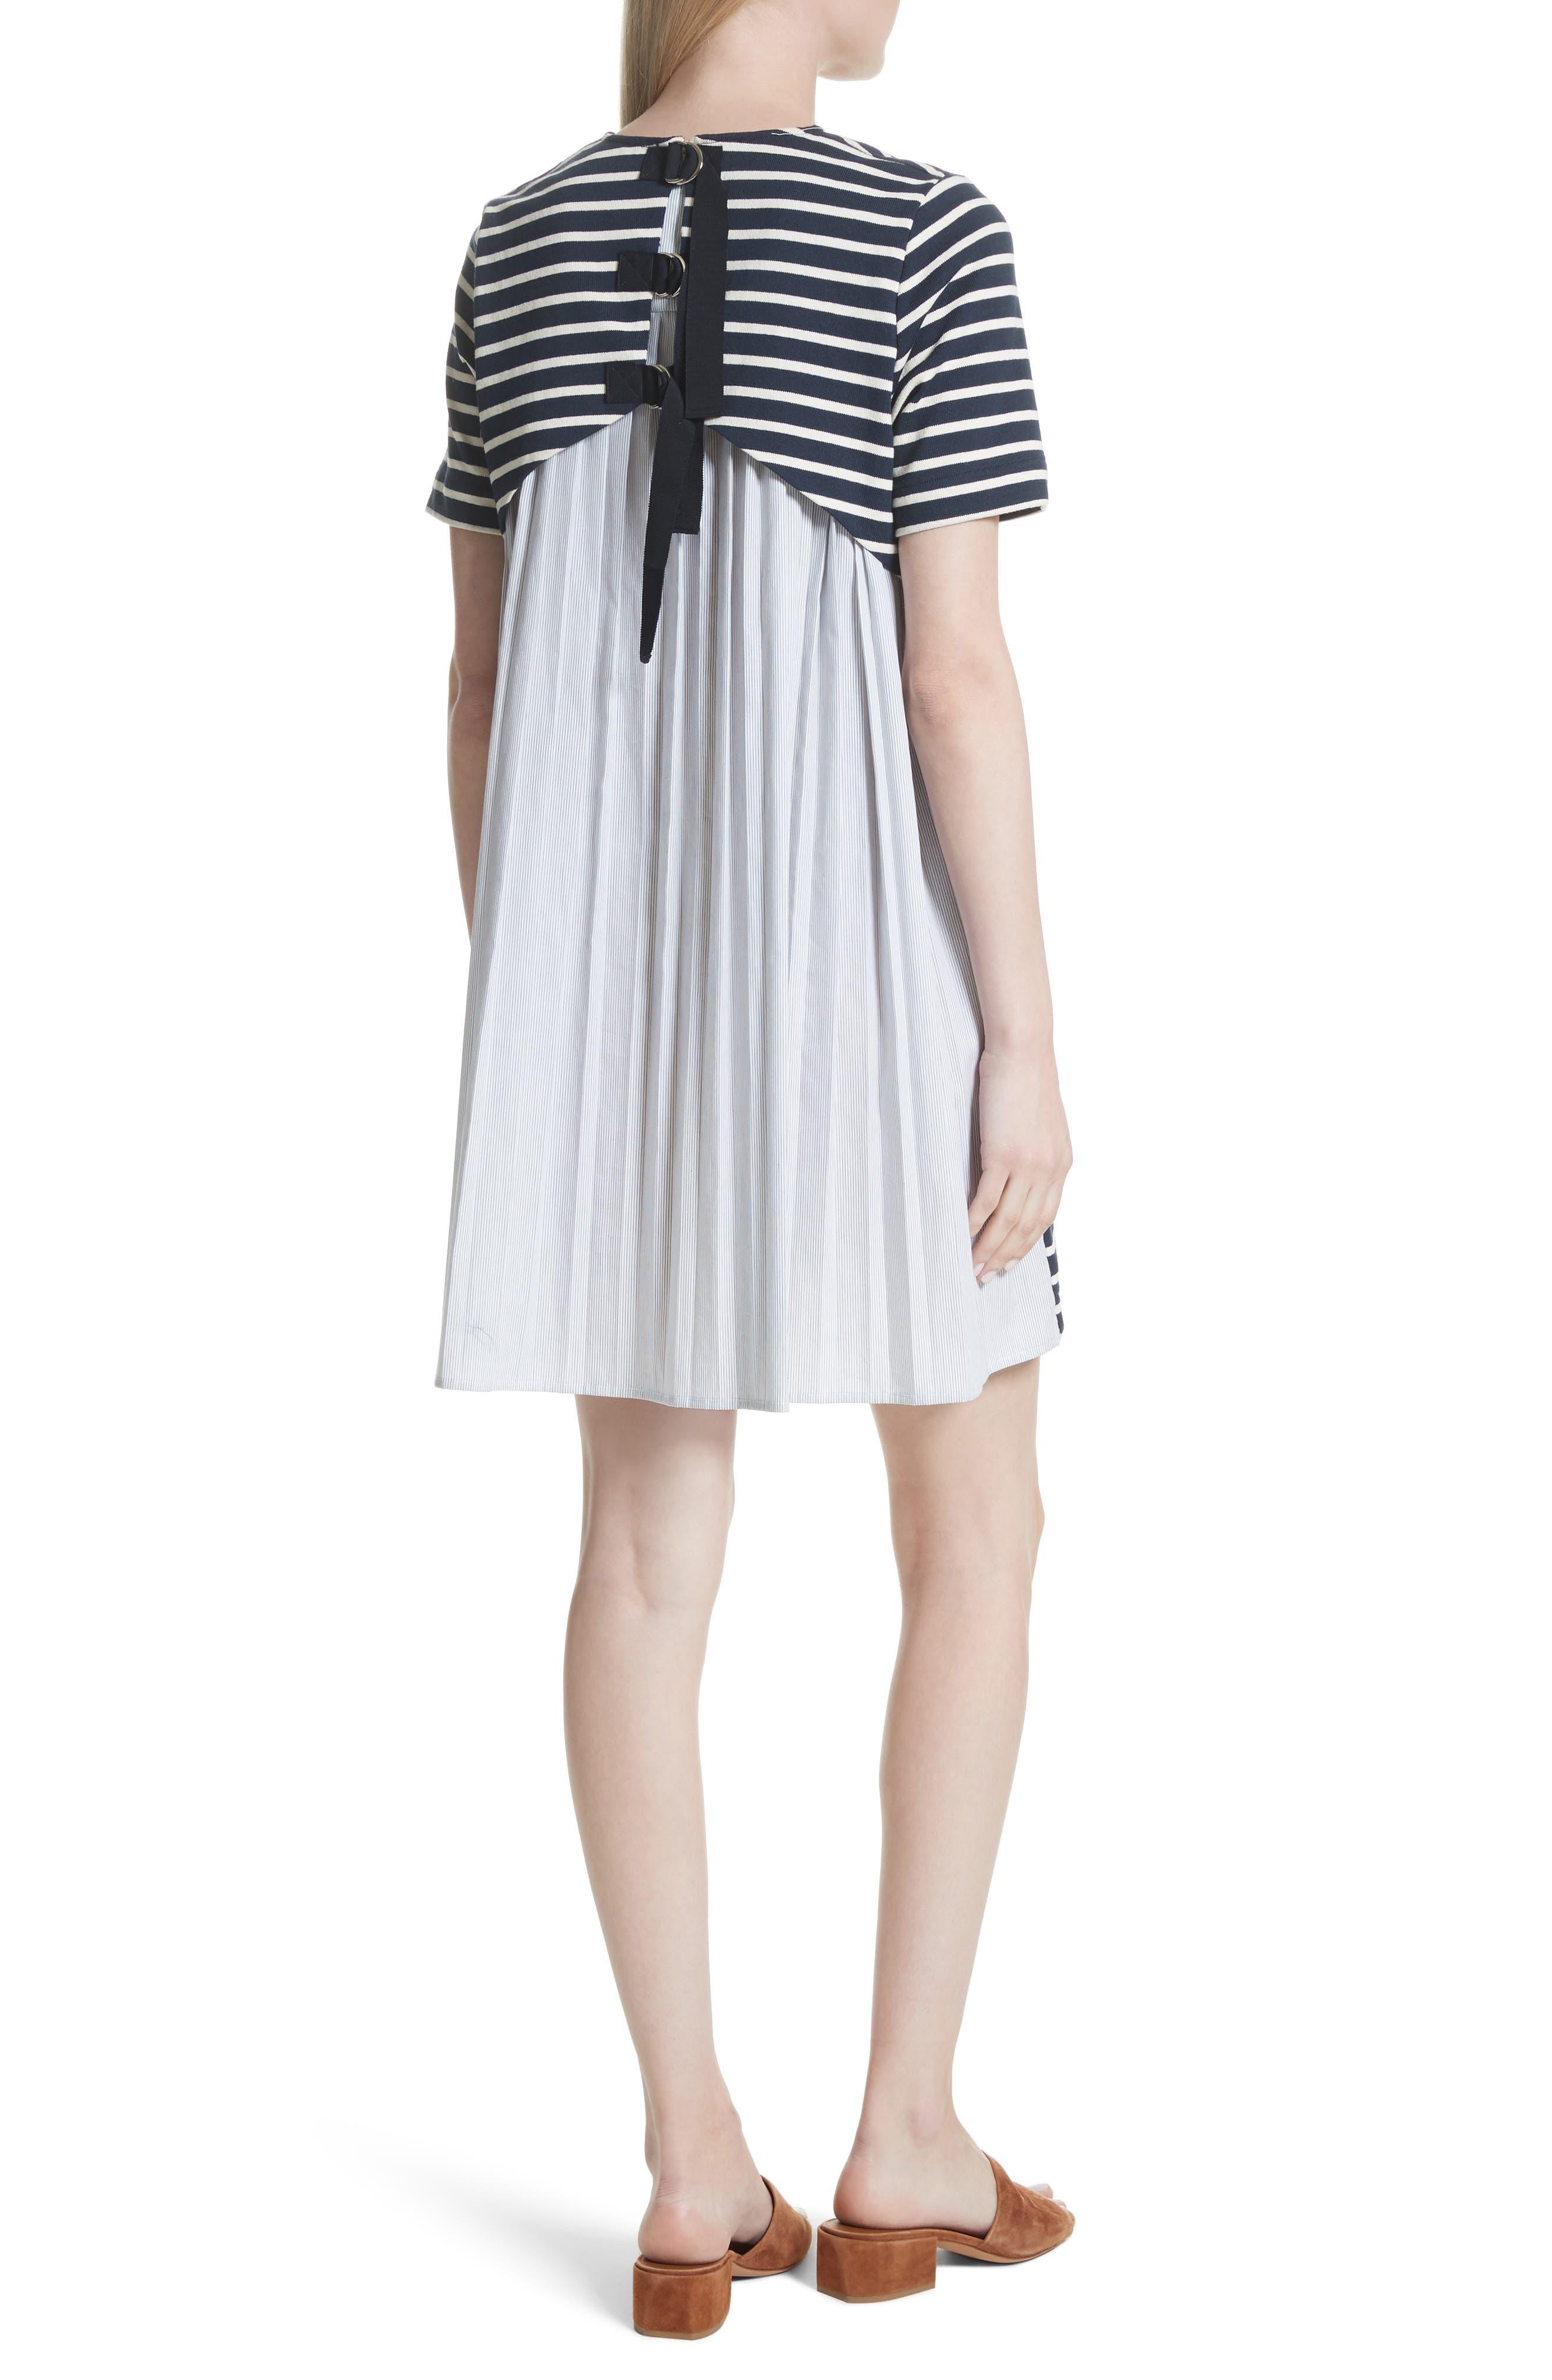 Latch Back Tunic Dress,                             Alternate thumbnail 2, color,                             Navy/ Cream Multi